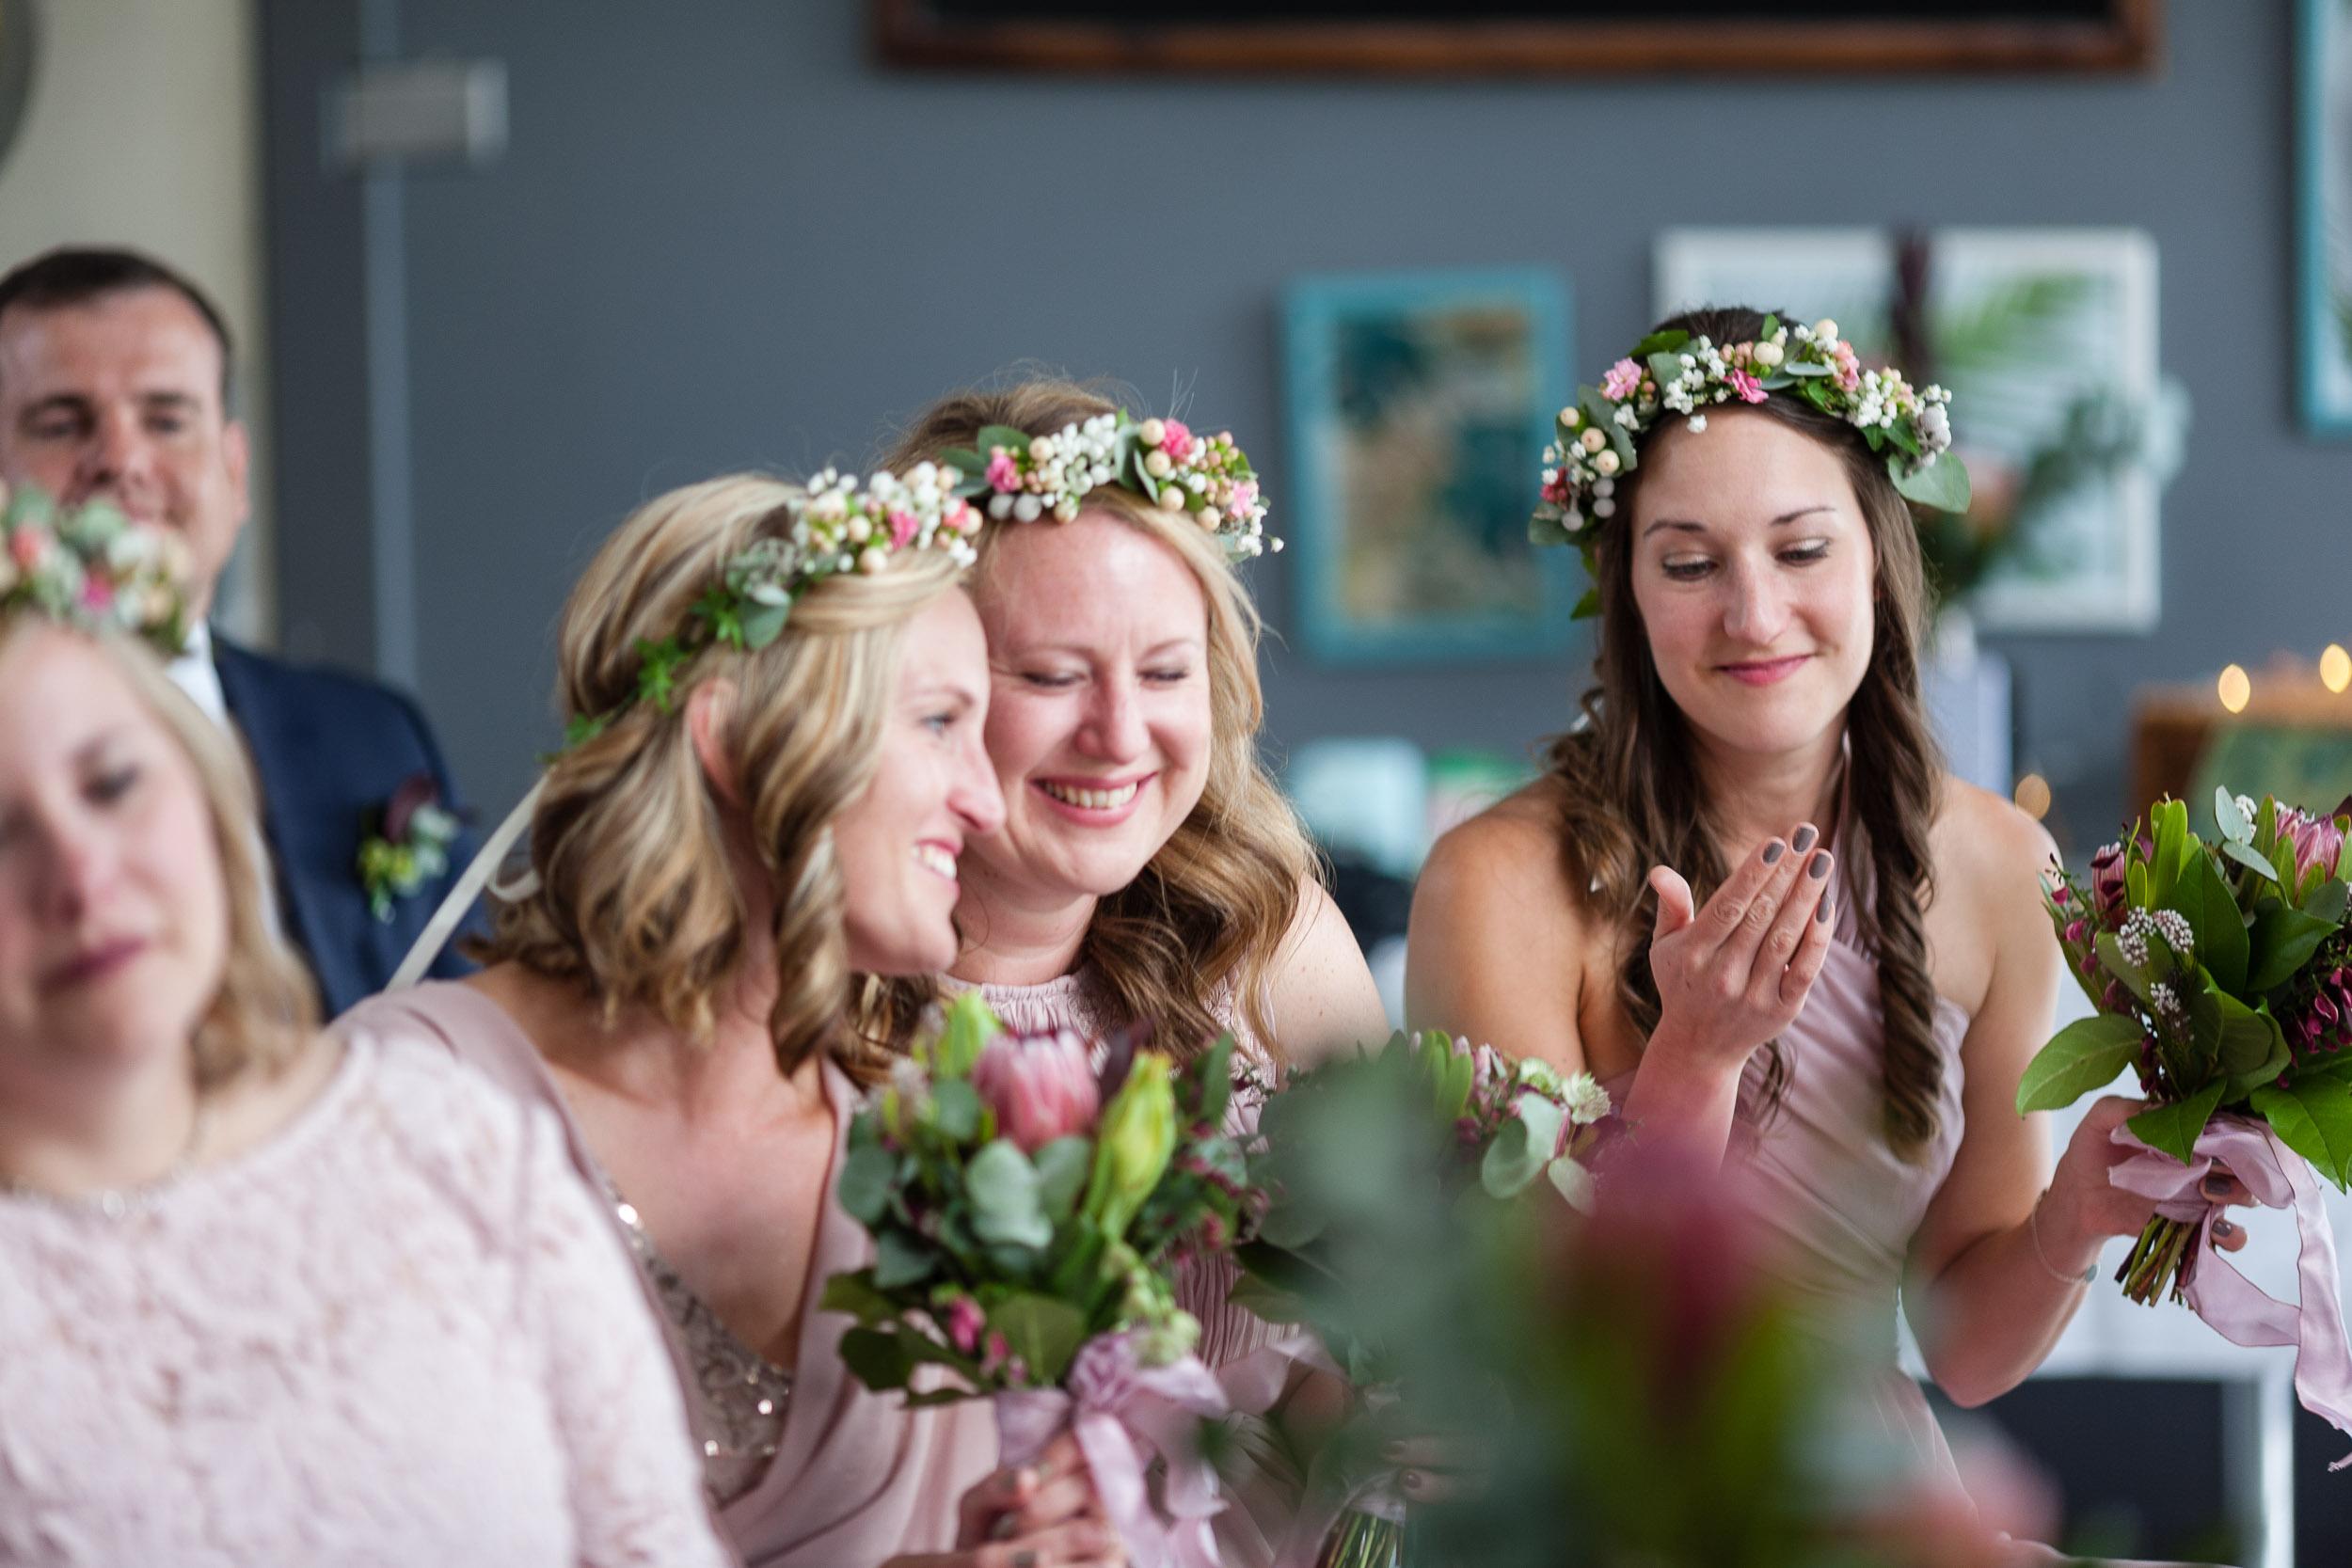 brockwell-lido-brixton-herne-hill-wedding-163.jpg